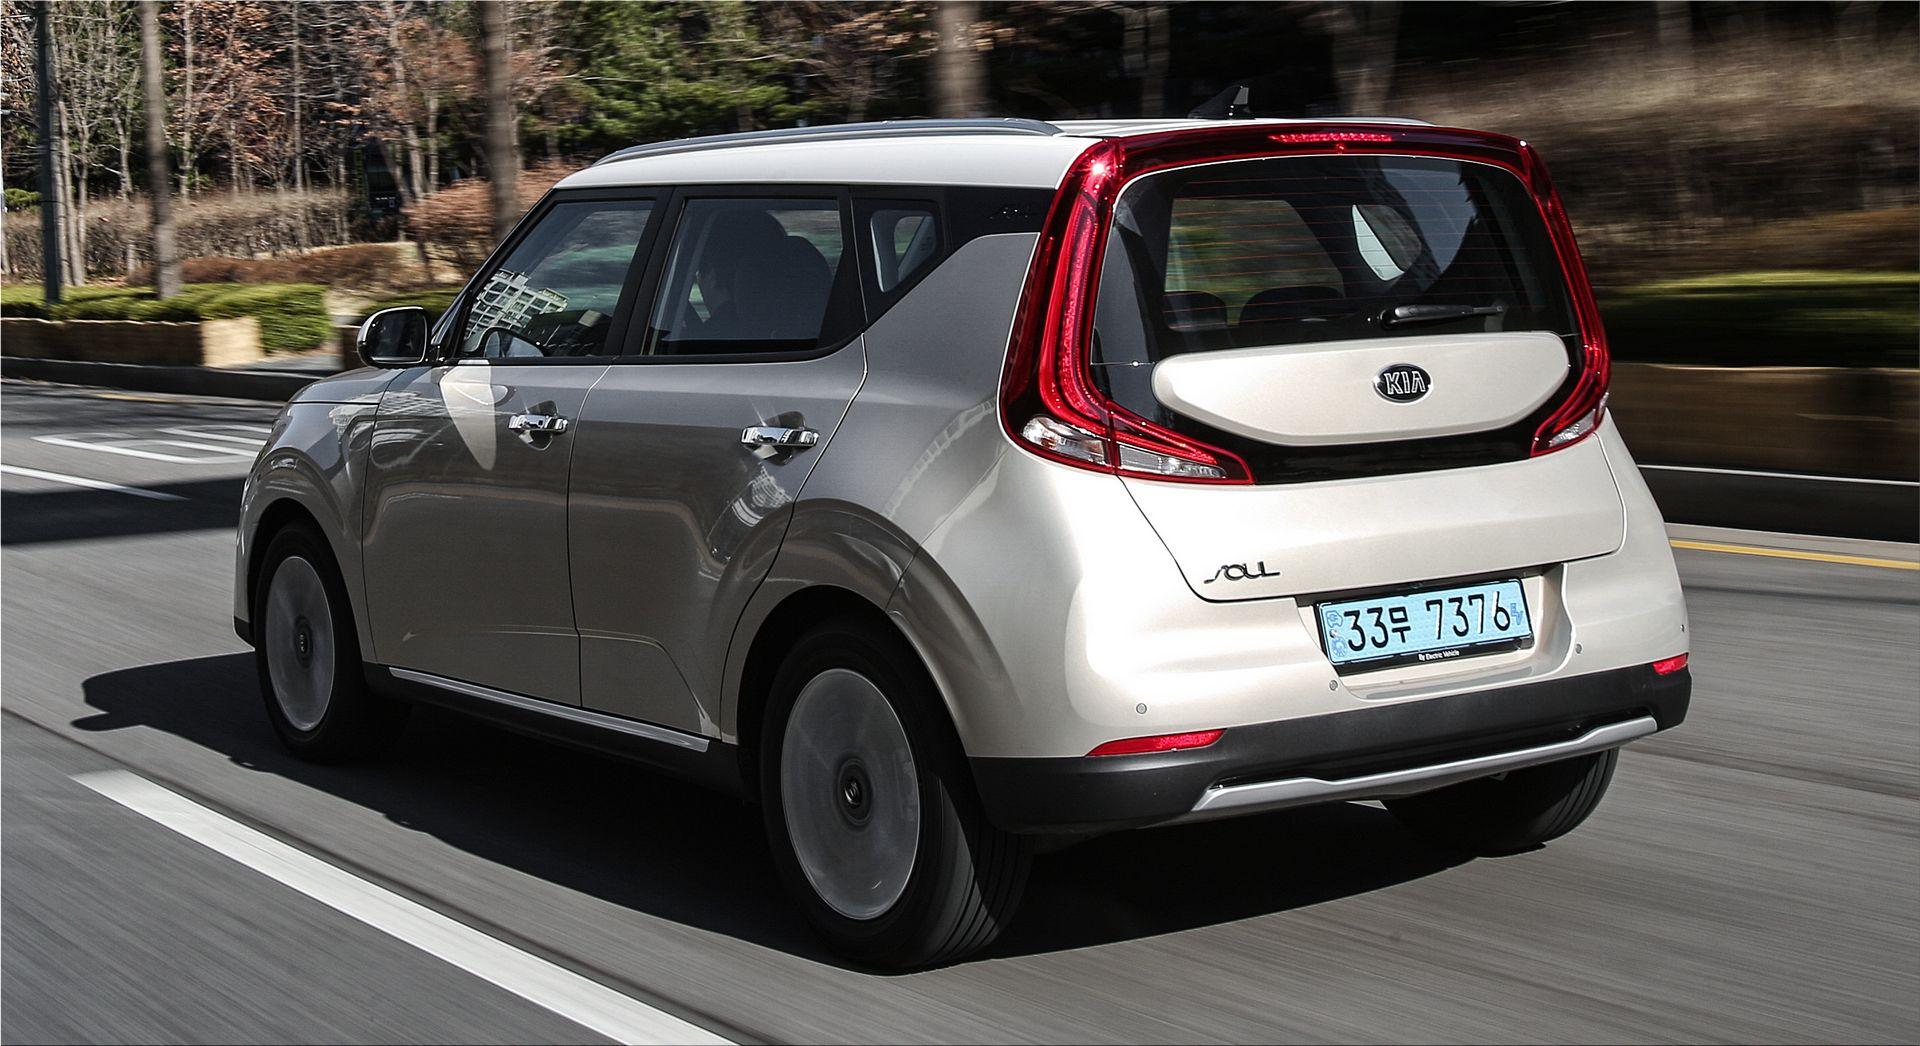 kia soul ev wins 2020 world urban car award electric cars electric hunter kia soul ev wins 2020 world urban car